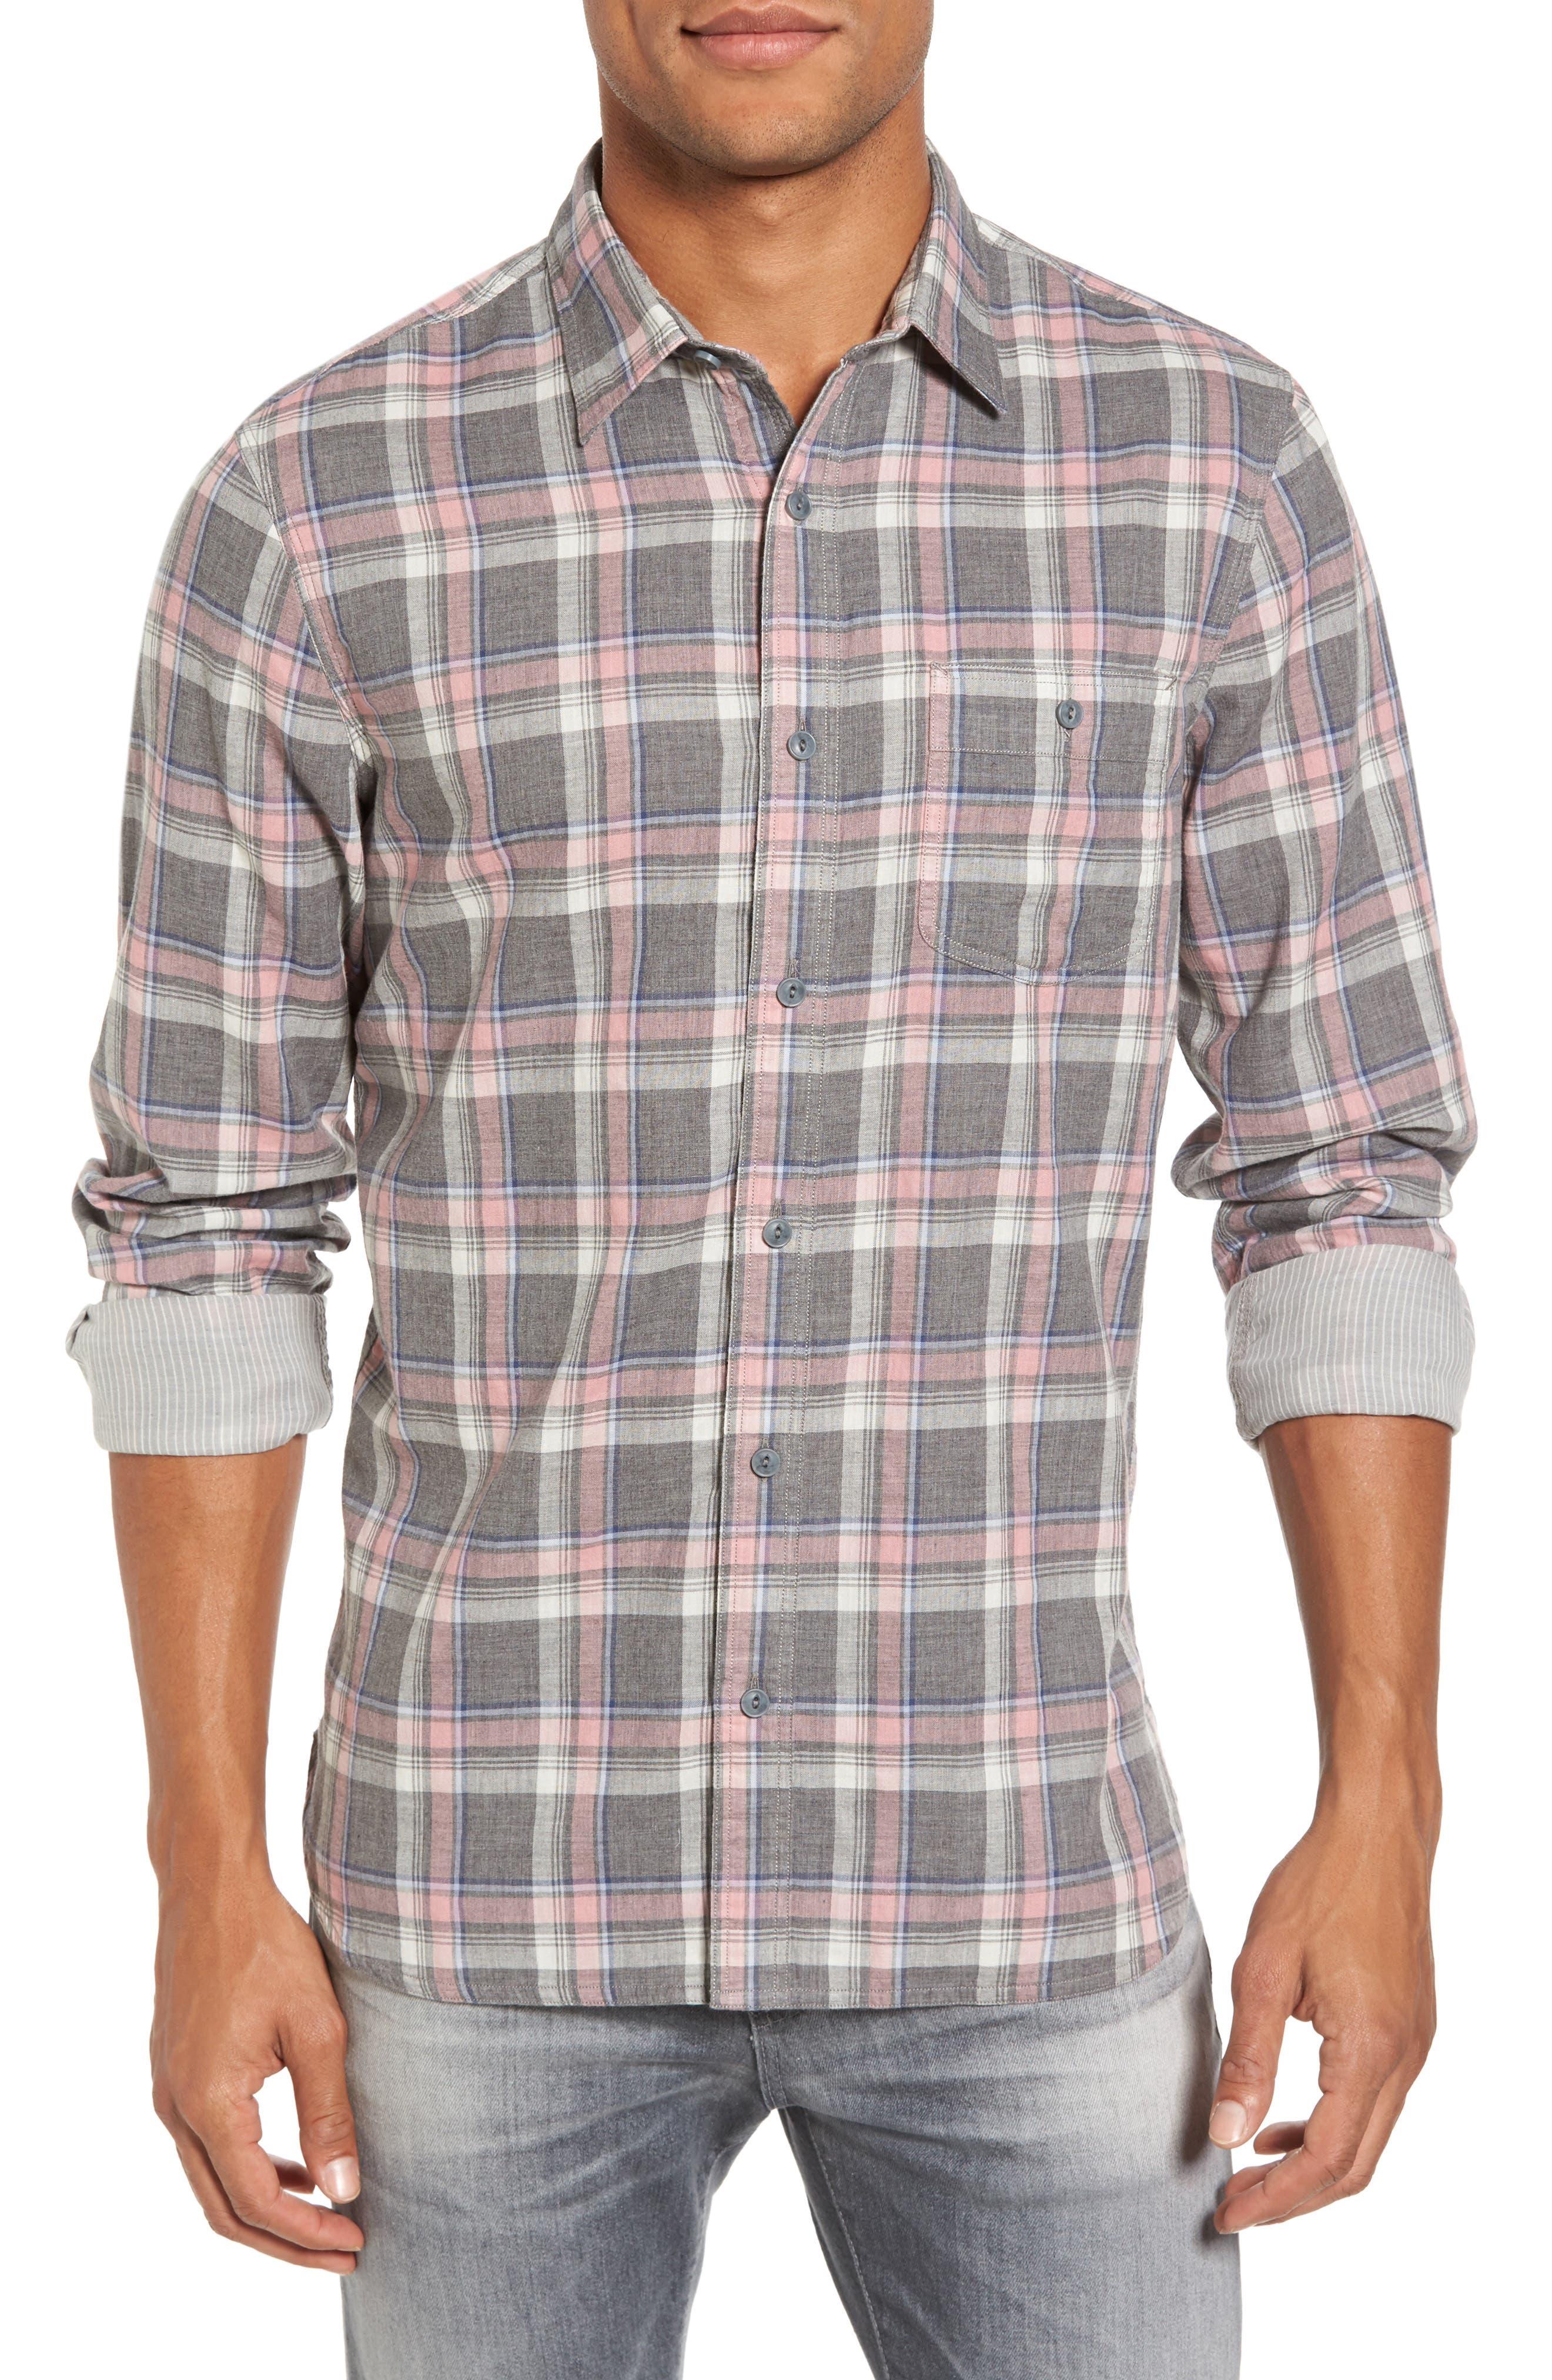 Trim Fit Utility Duofold Sport Shirt,                             Main thumbnail 1, color,                             Grey Paloma Pink Plaid Duofold